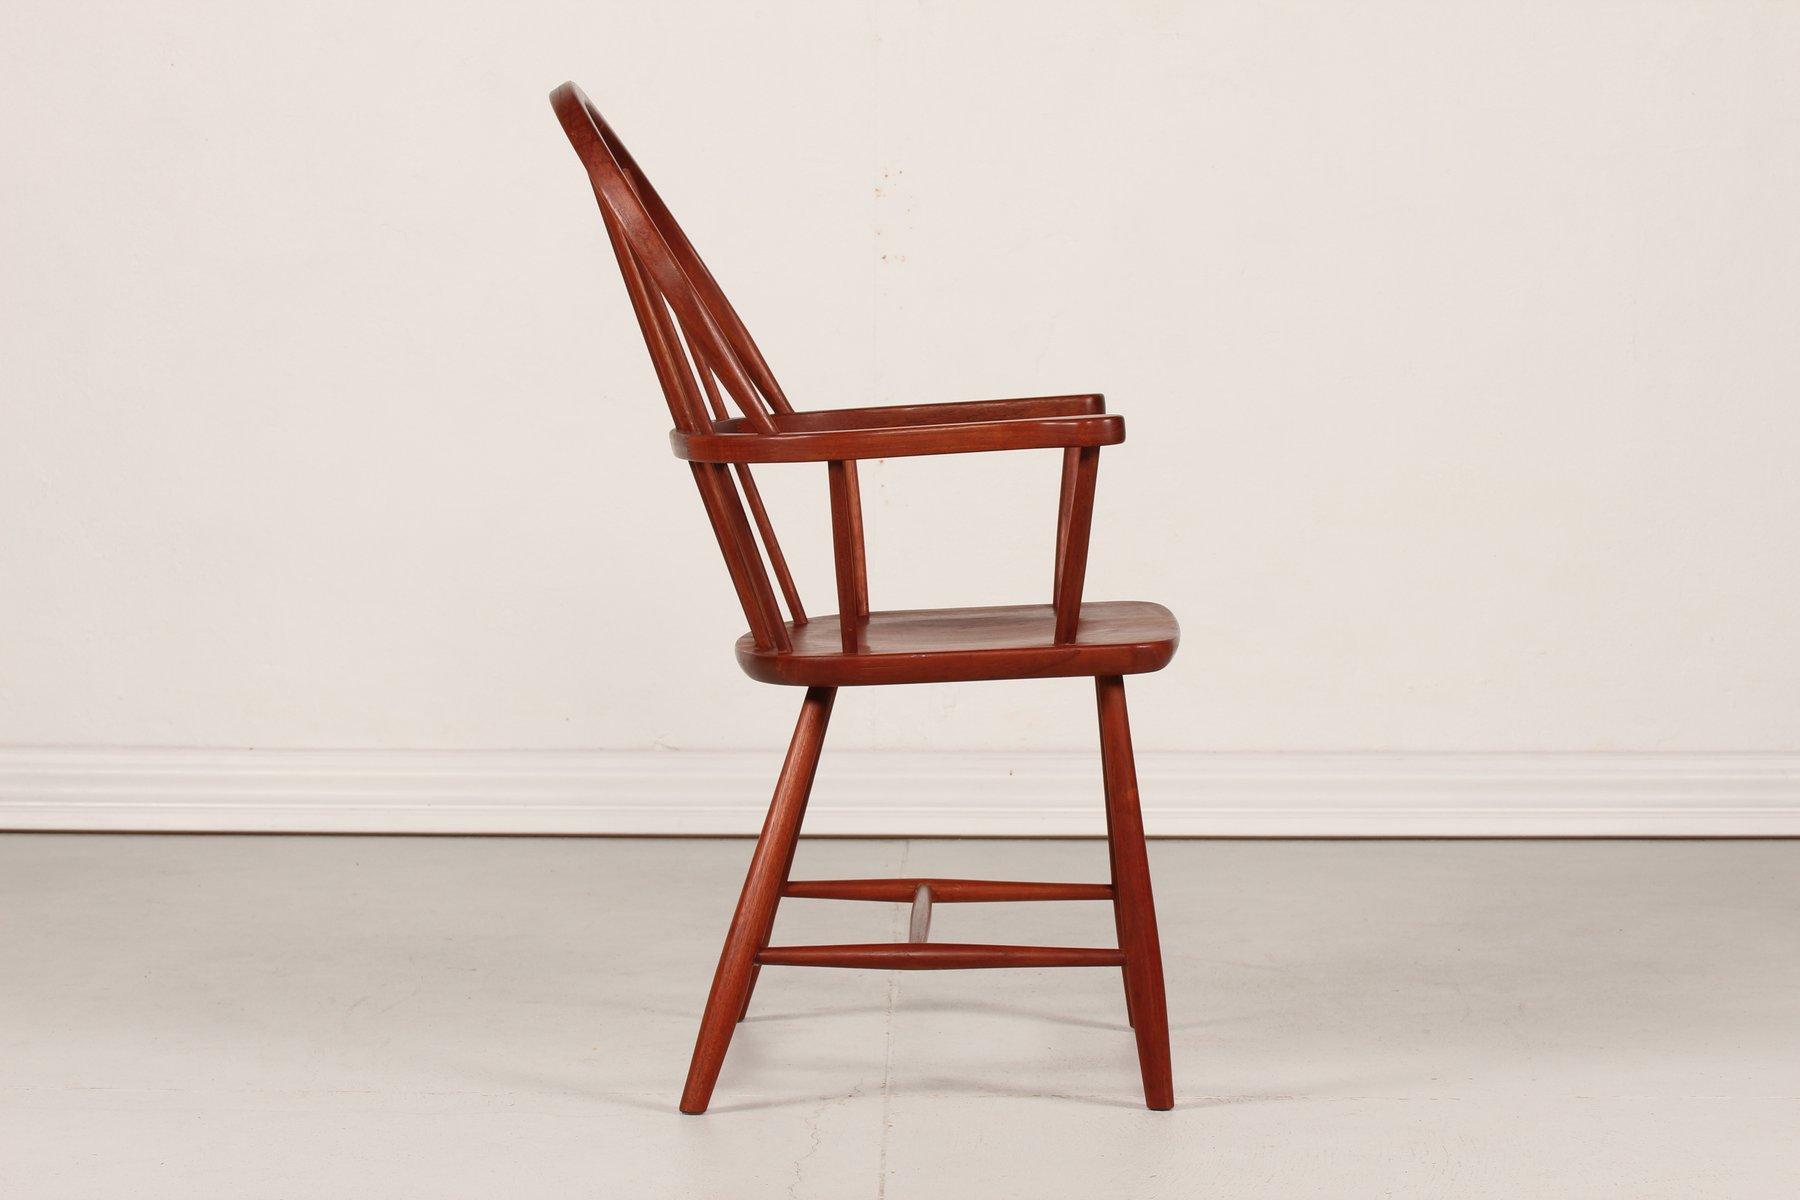 D nischer mid century windsor stuhl aus teakholz bei pamono kaufen - Windsor stuhl ...